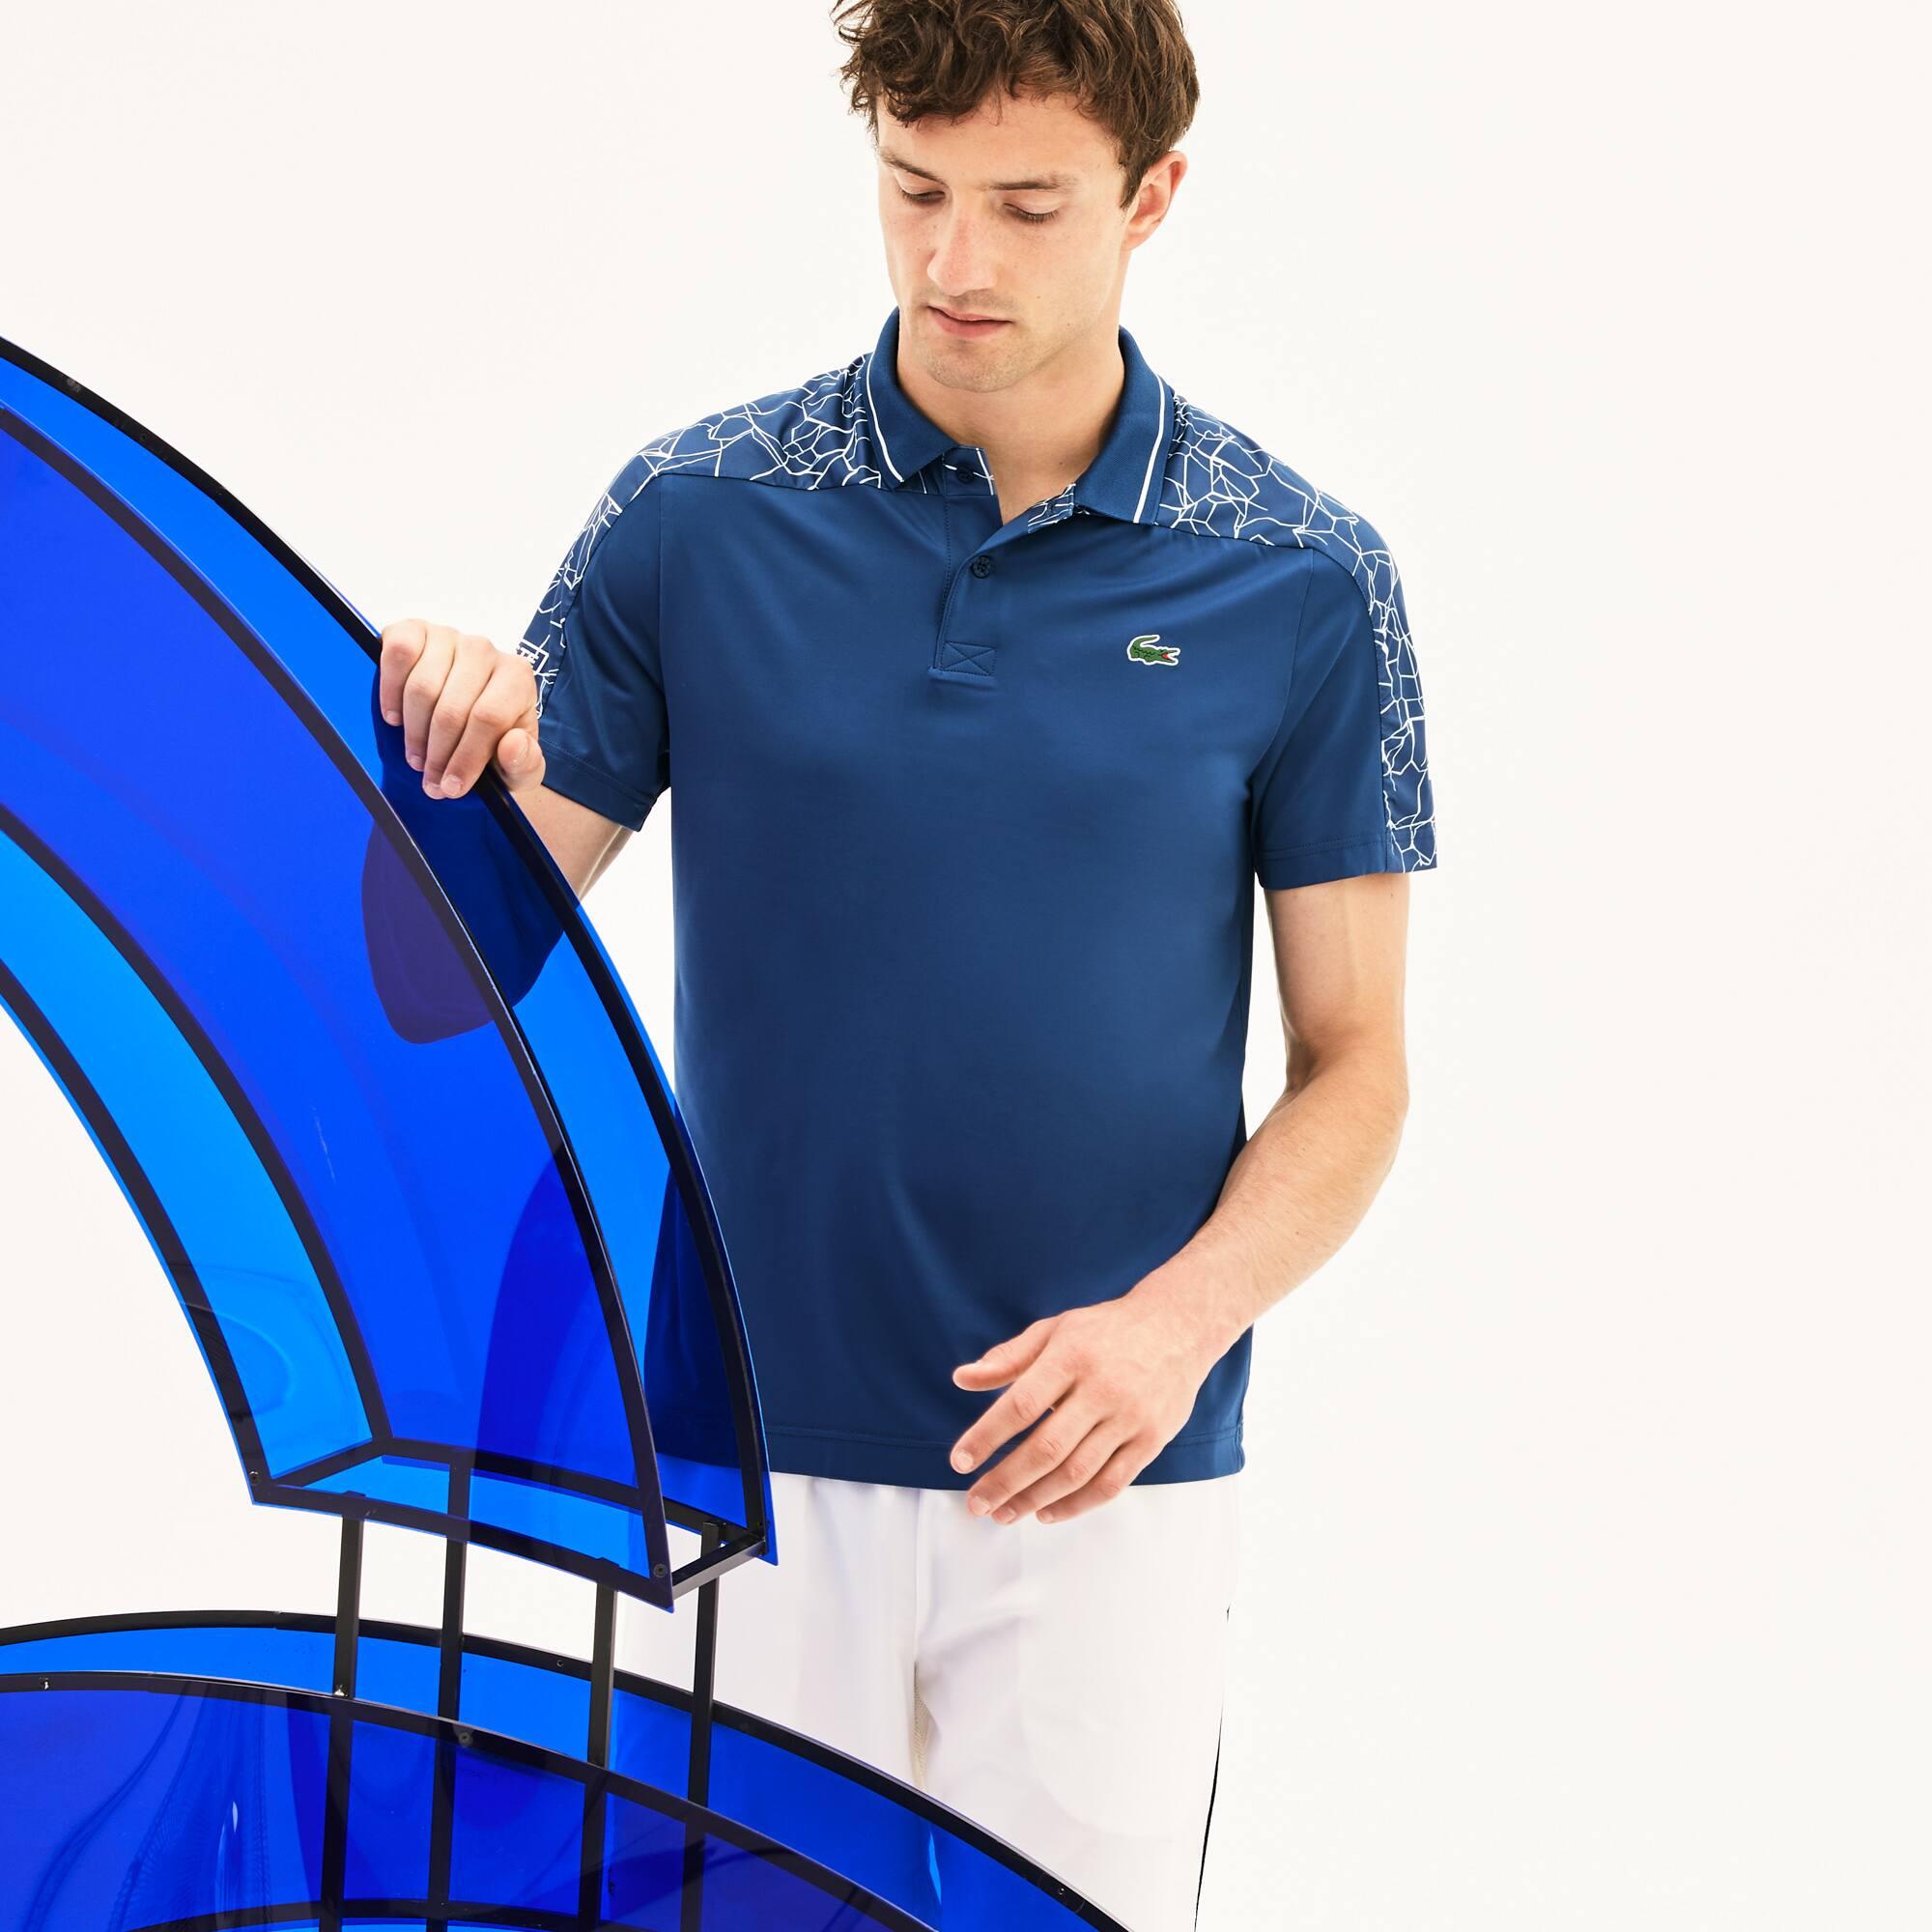 Lacoste - Herren-Poloshirt aus Stretch-Jersey LACOSTE SPORT NOVAK DJOKOVIC - 1